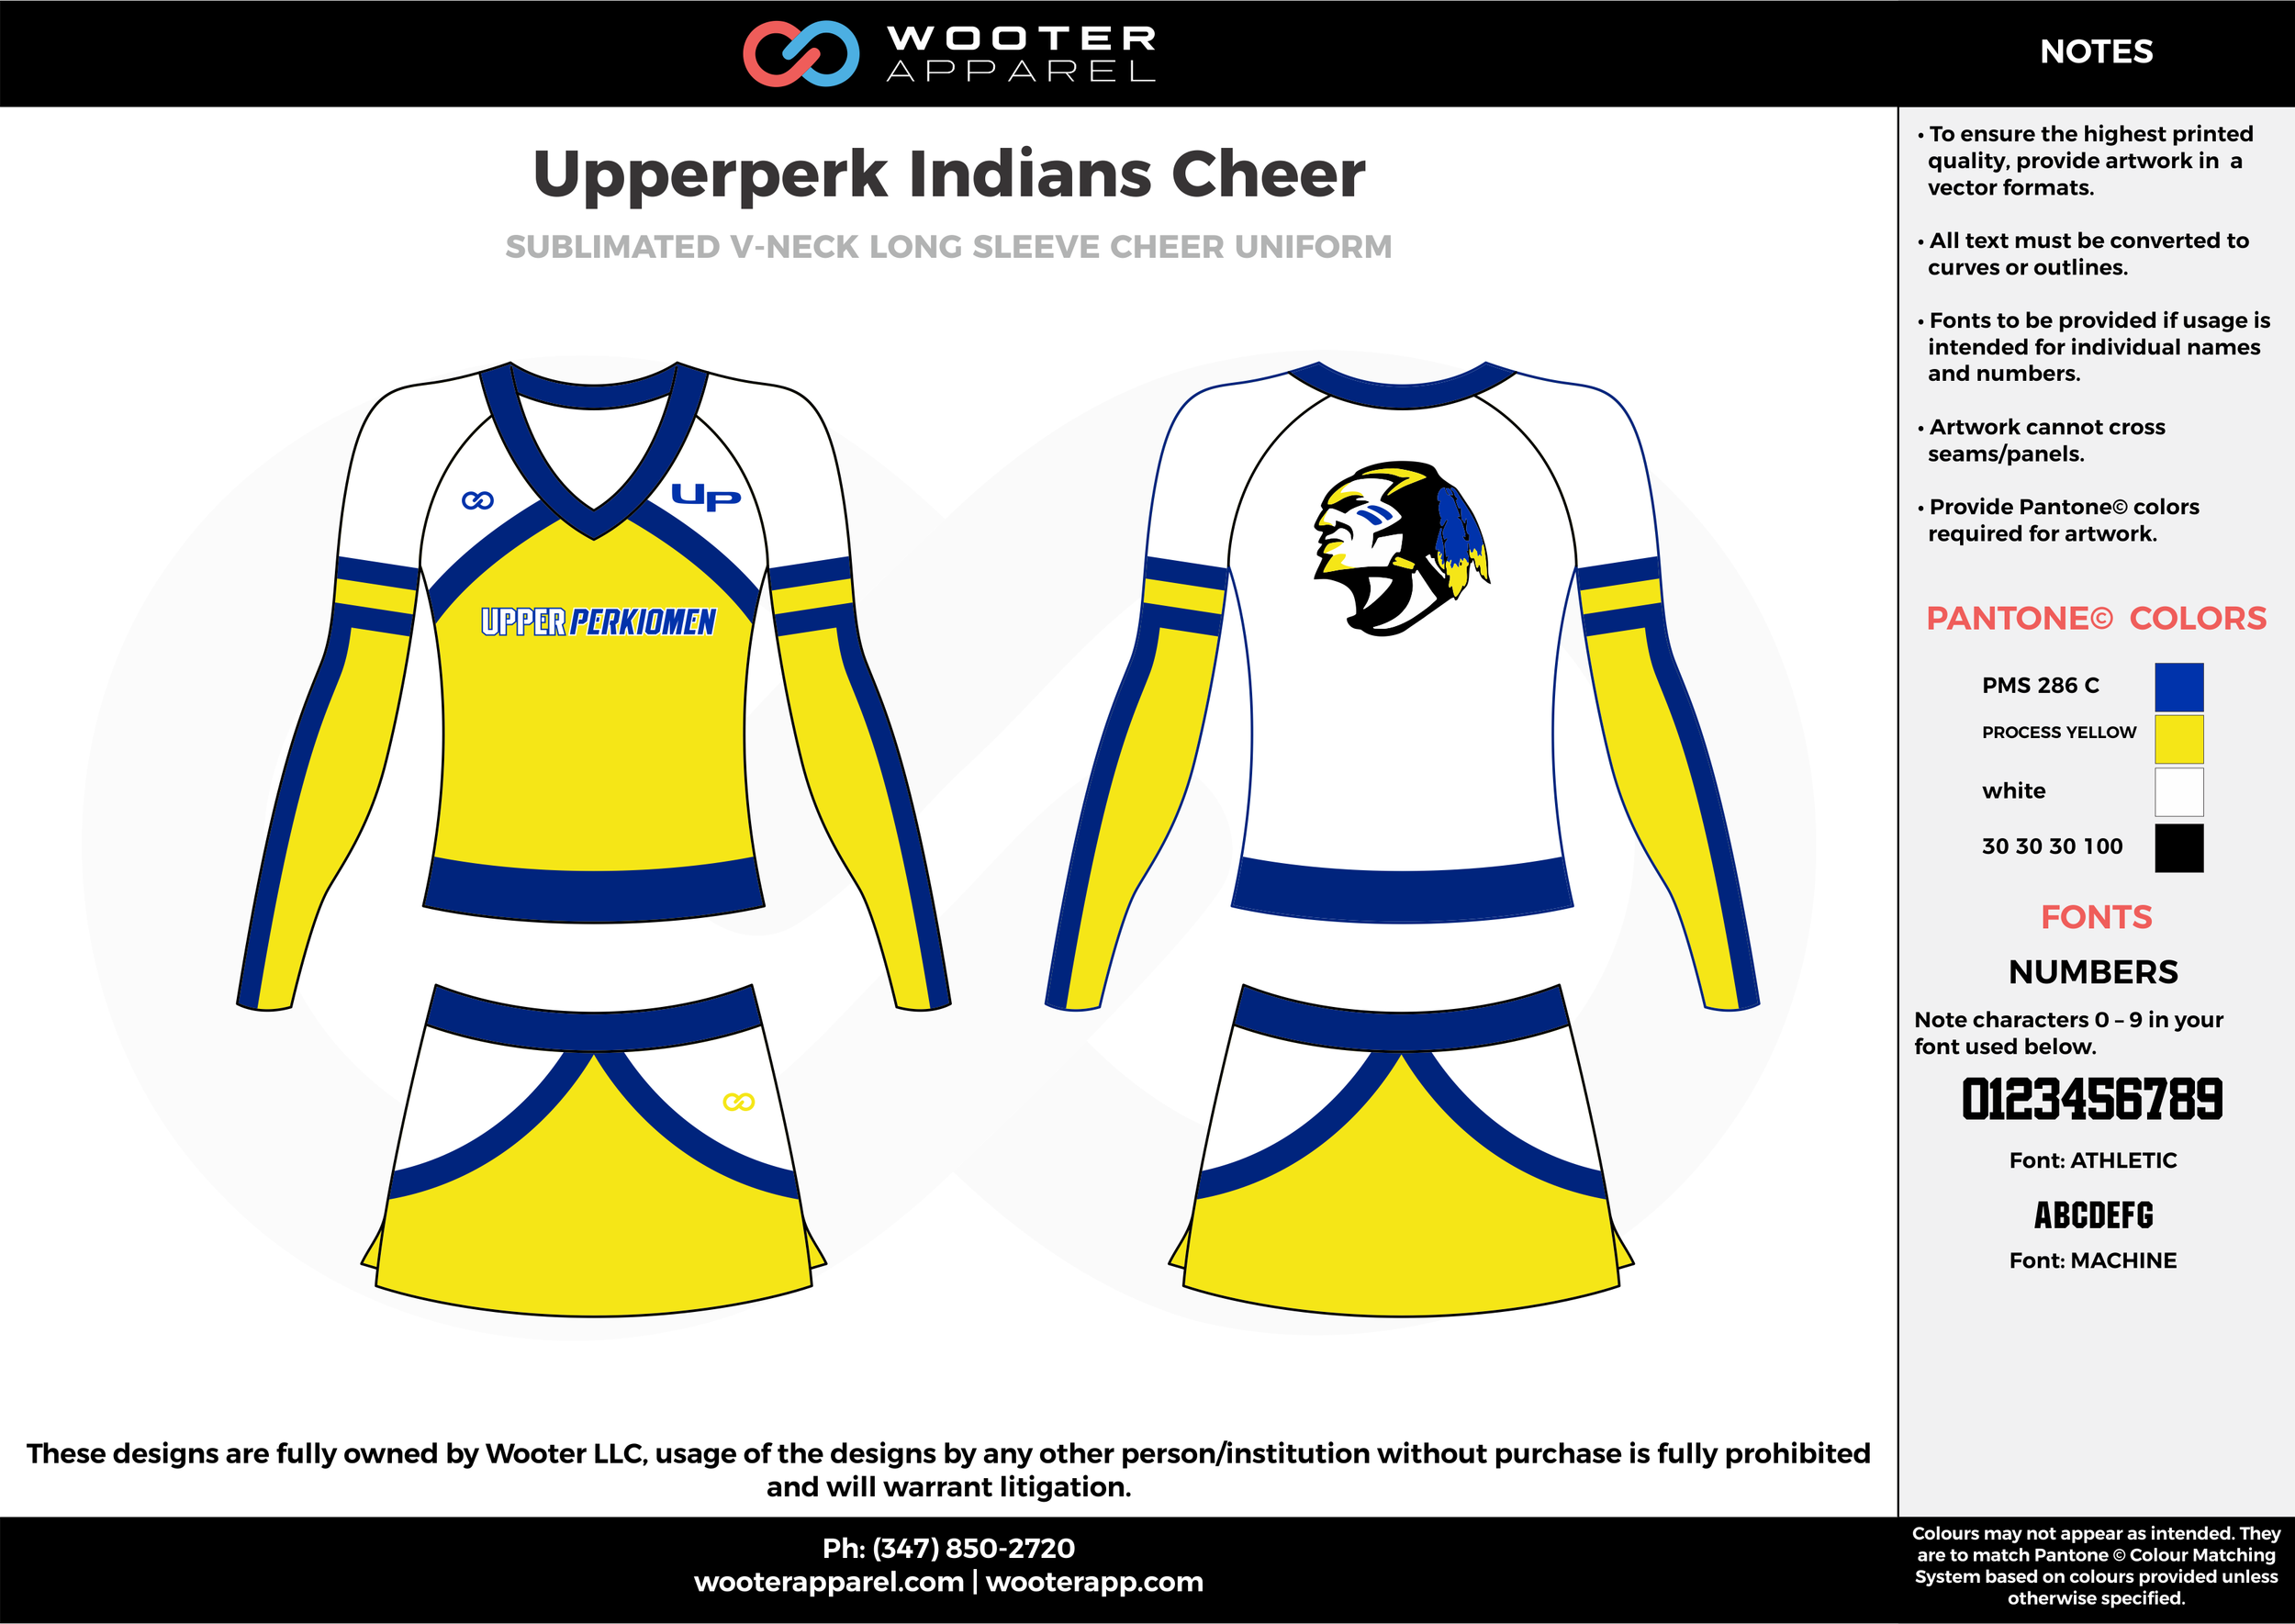 Upperperk Indians Cheer yellow white blue cheerleading uniforms, top, and skirt